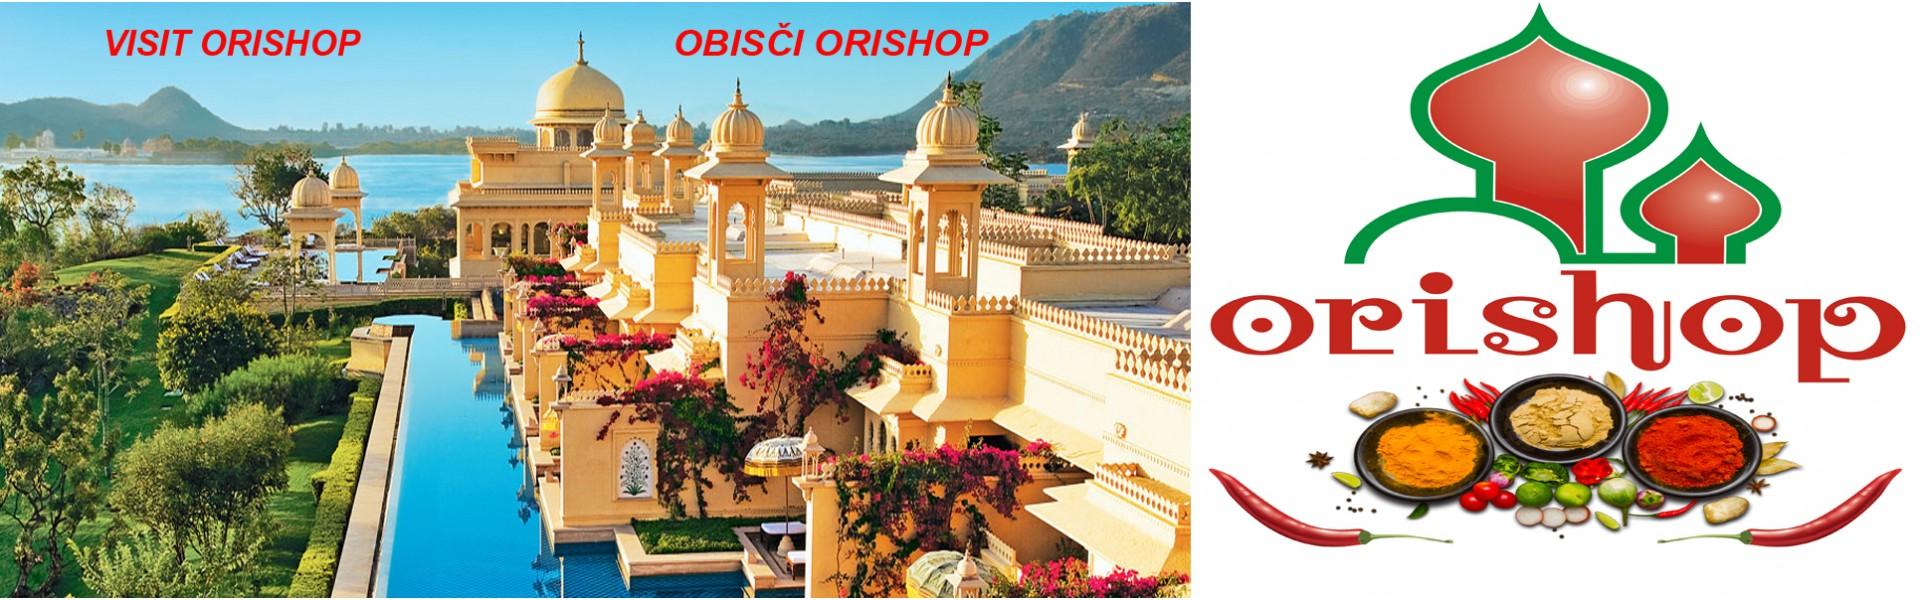 VISIT ORISHOP